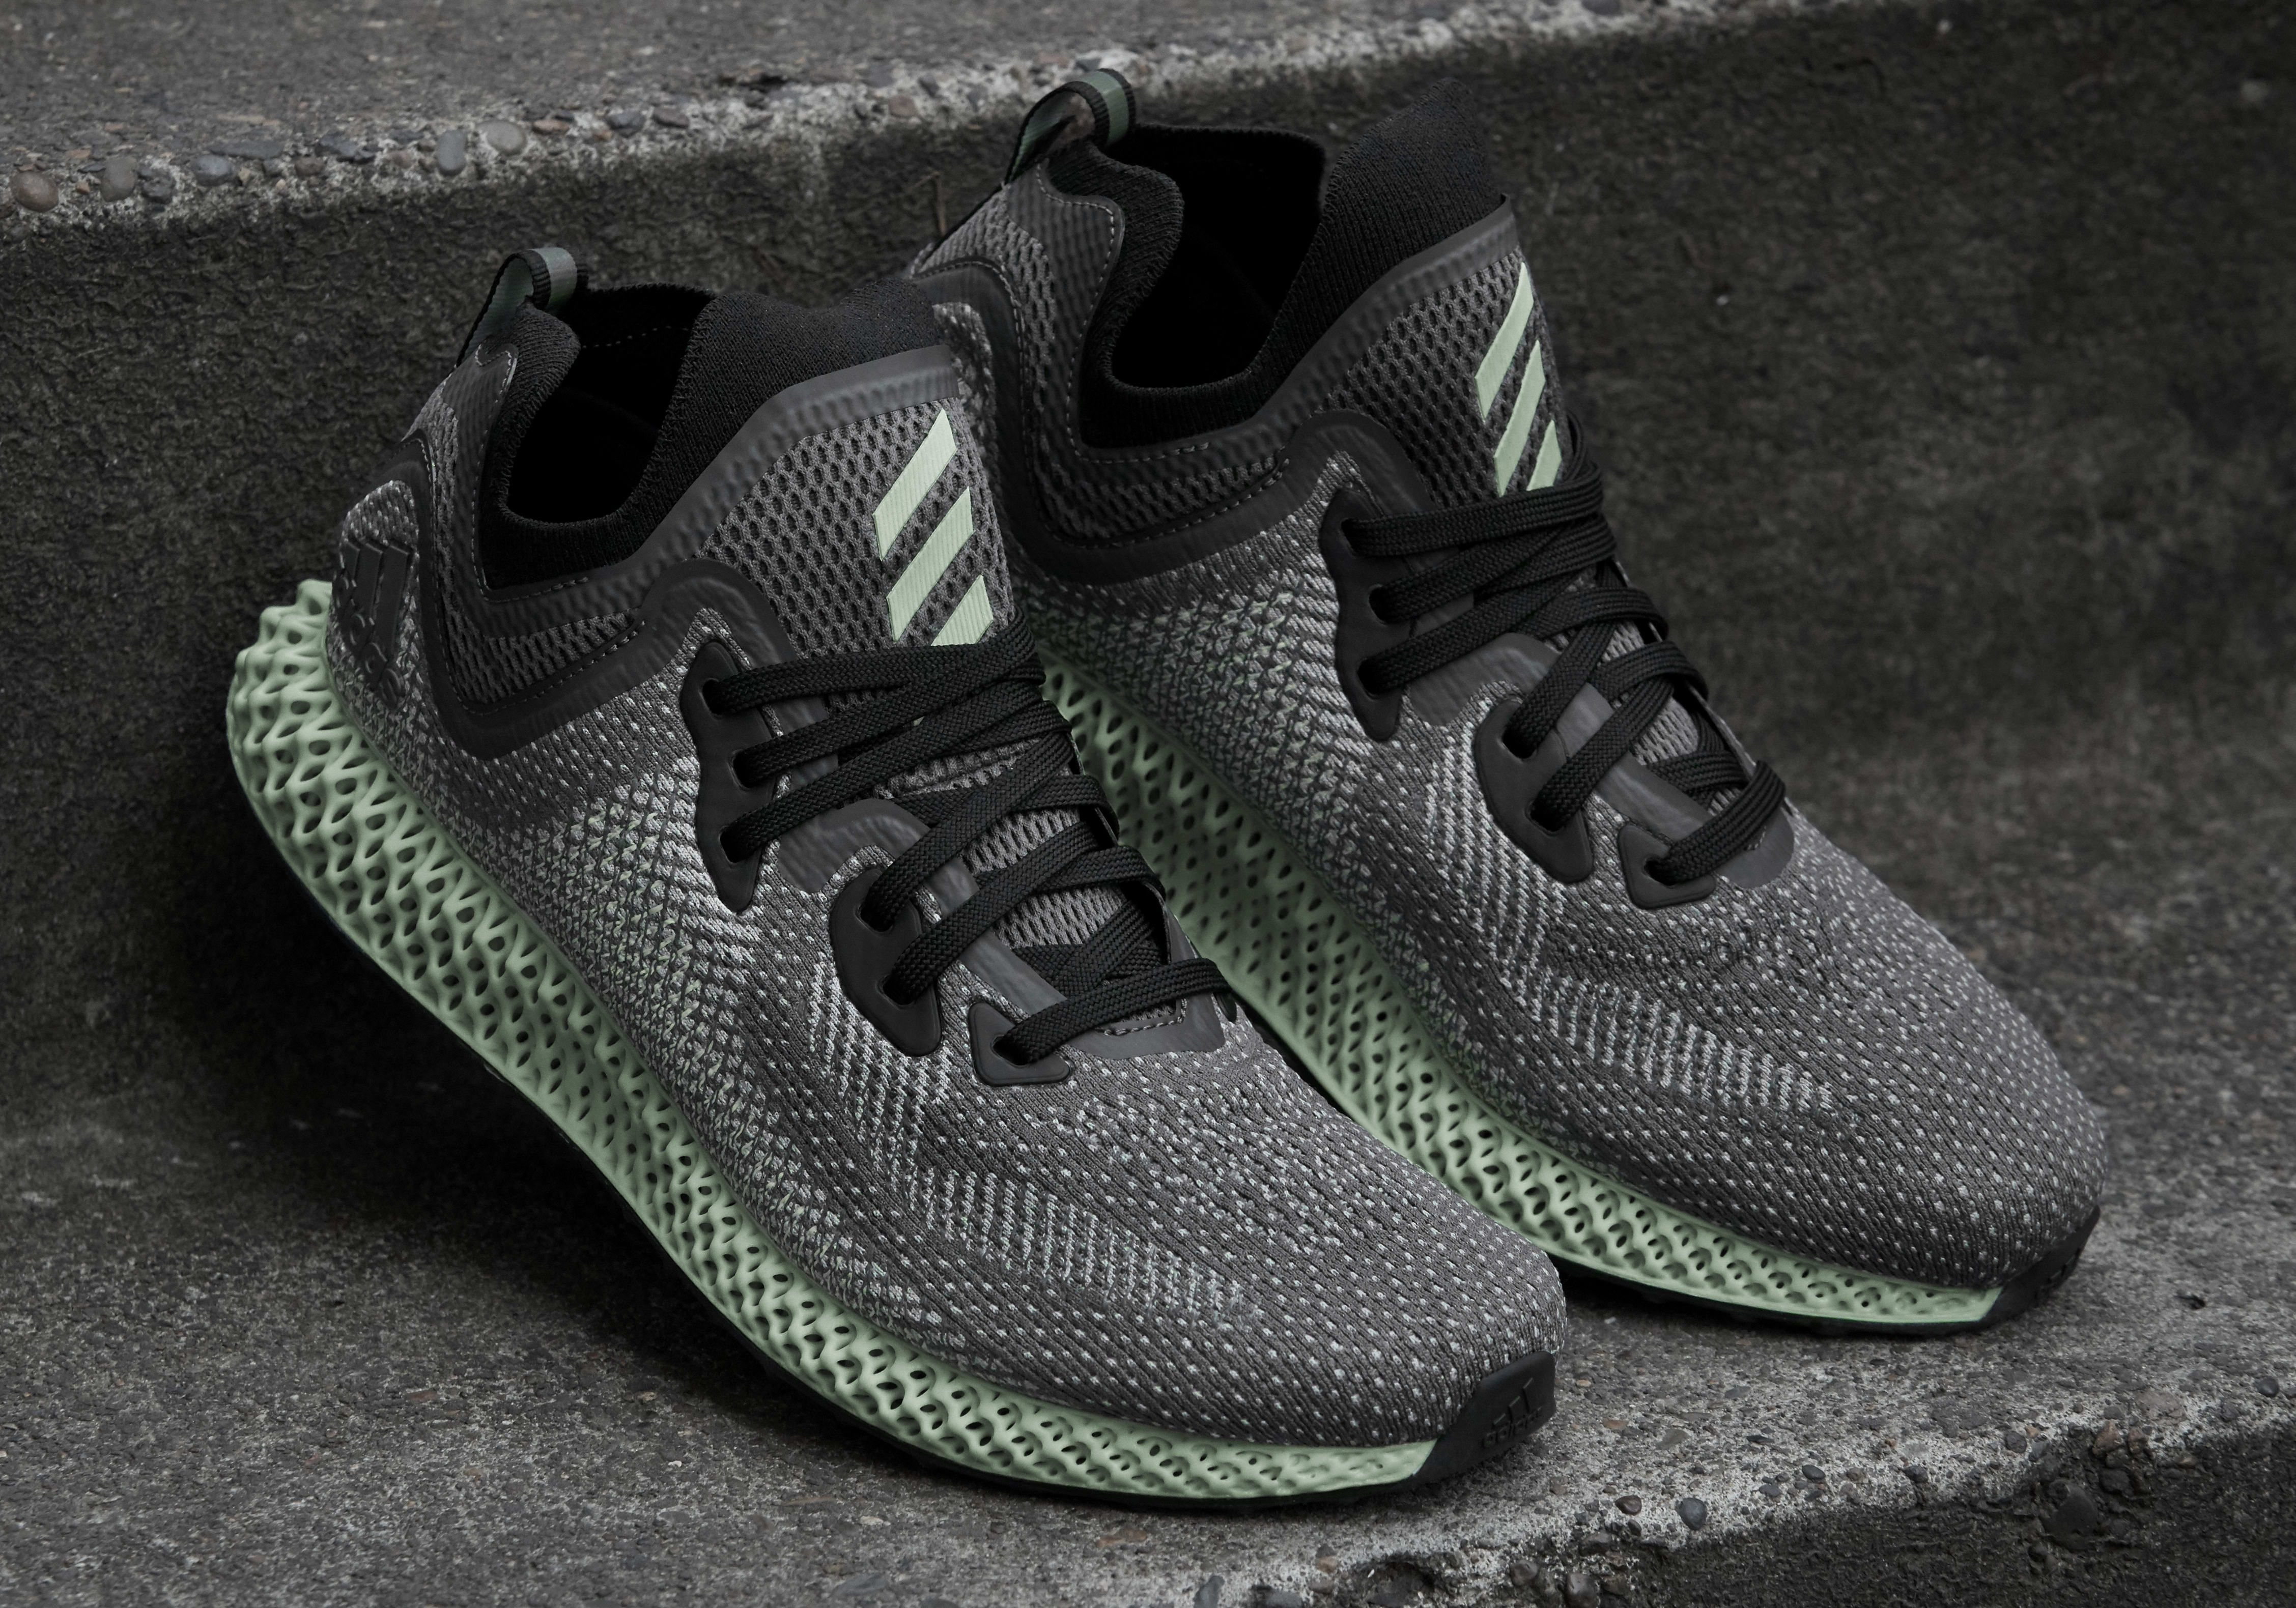 Adidas AlphaEdge 4D LTD AC8485 | Sneaker | Schuhe und Adidas